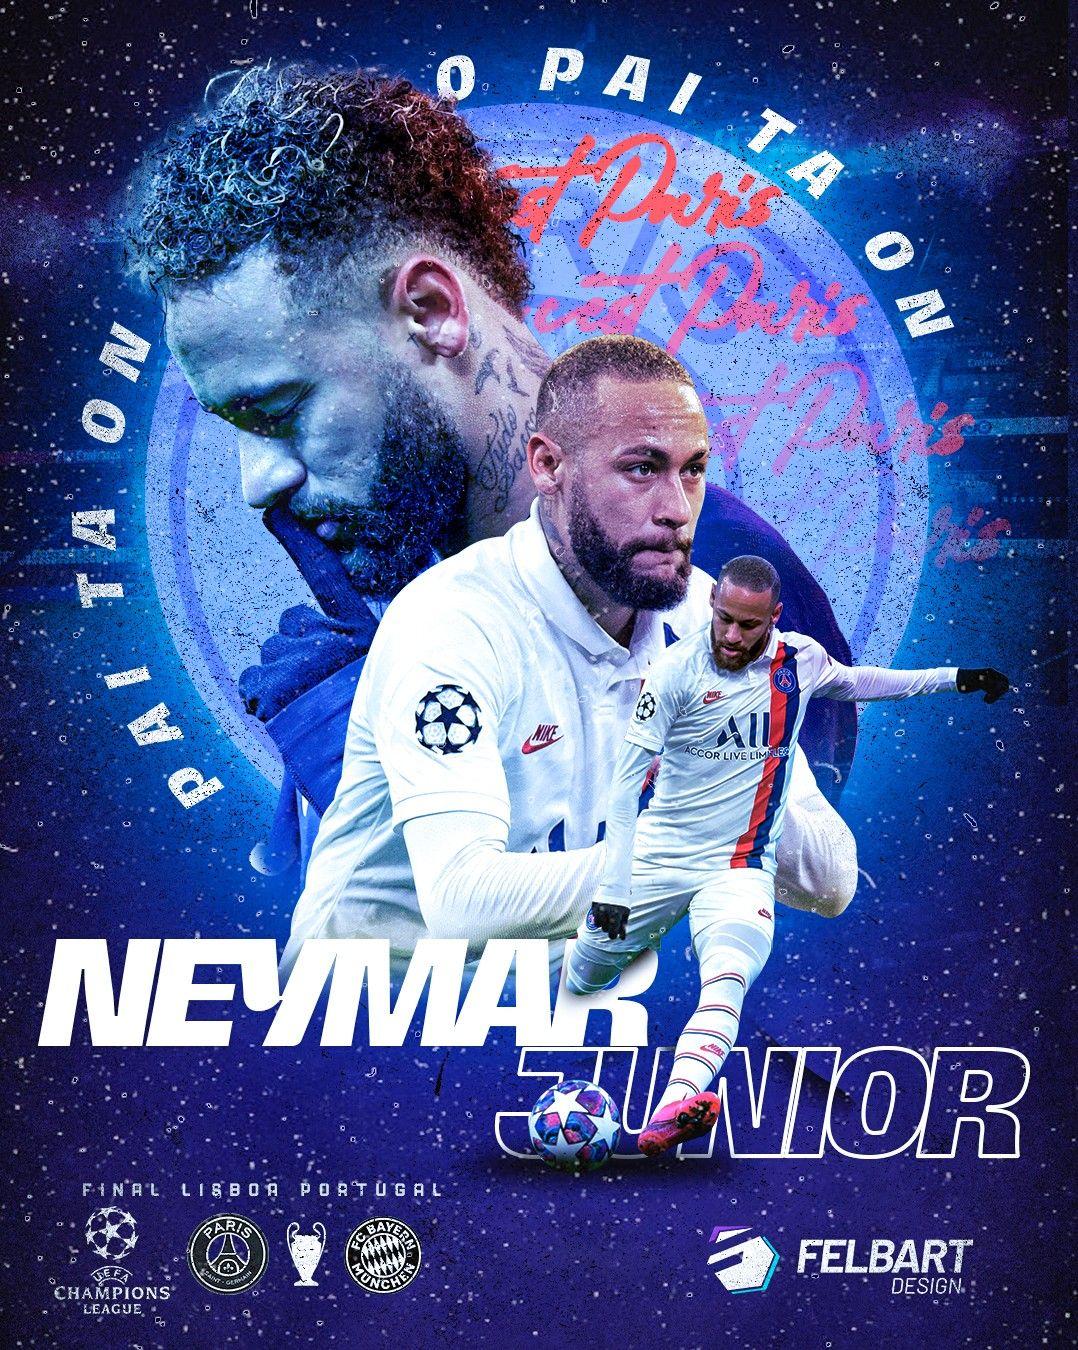 Neymar Jr in 2020 | Uefa champions league, Champions ...